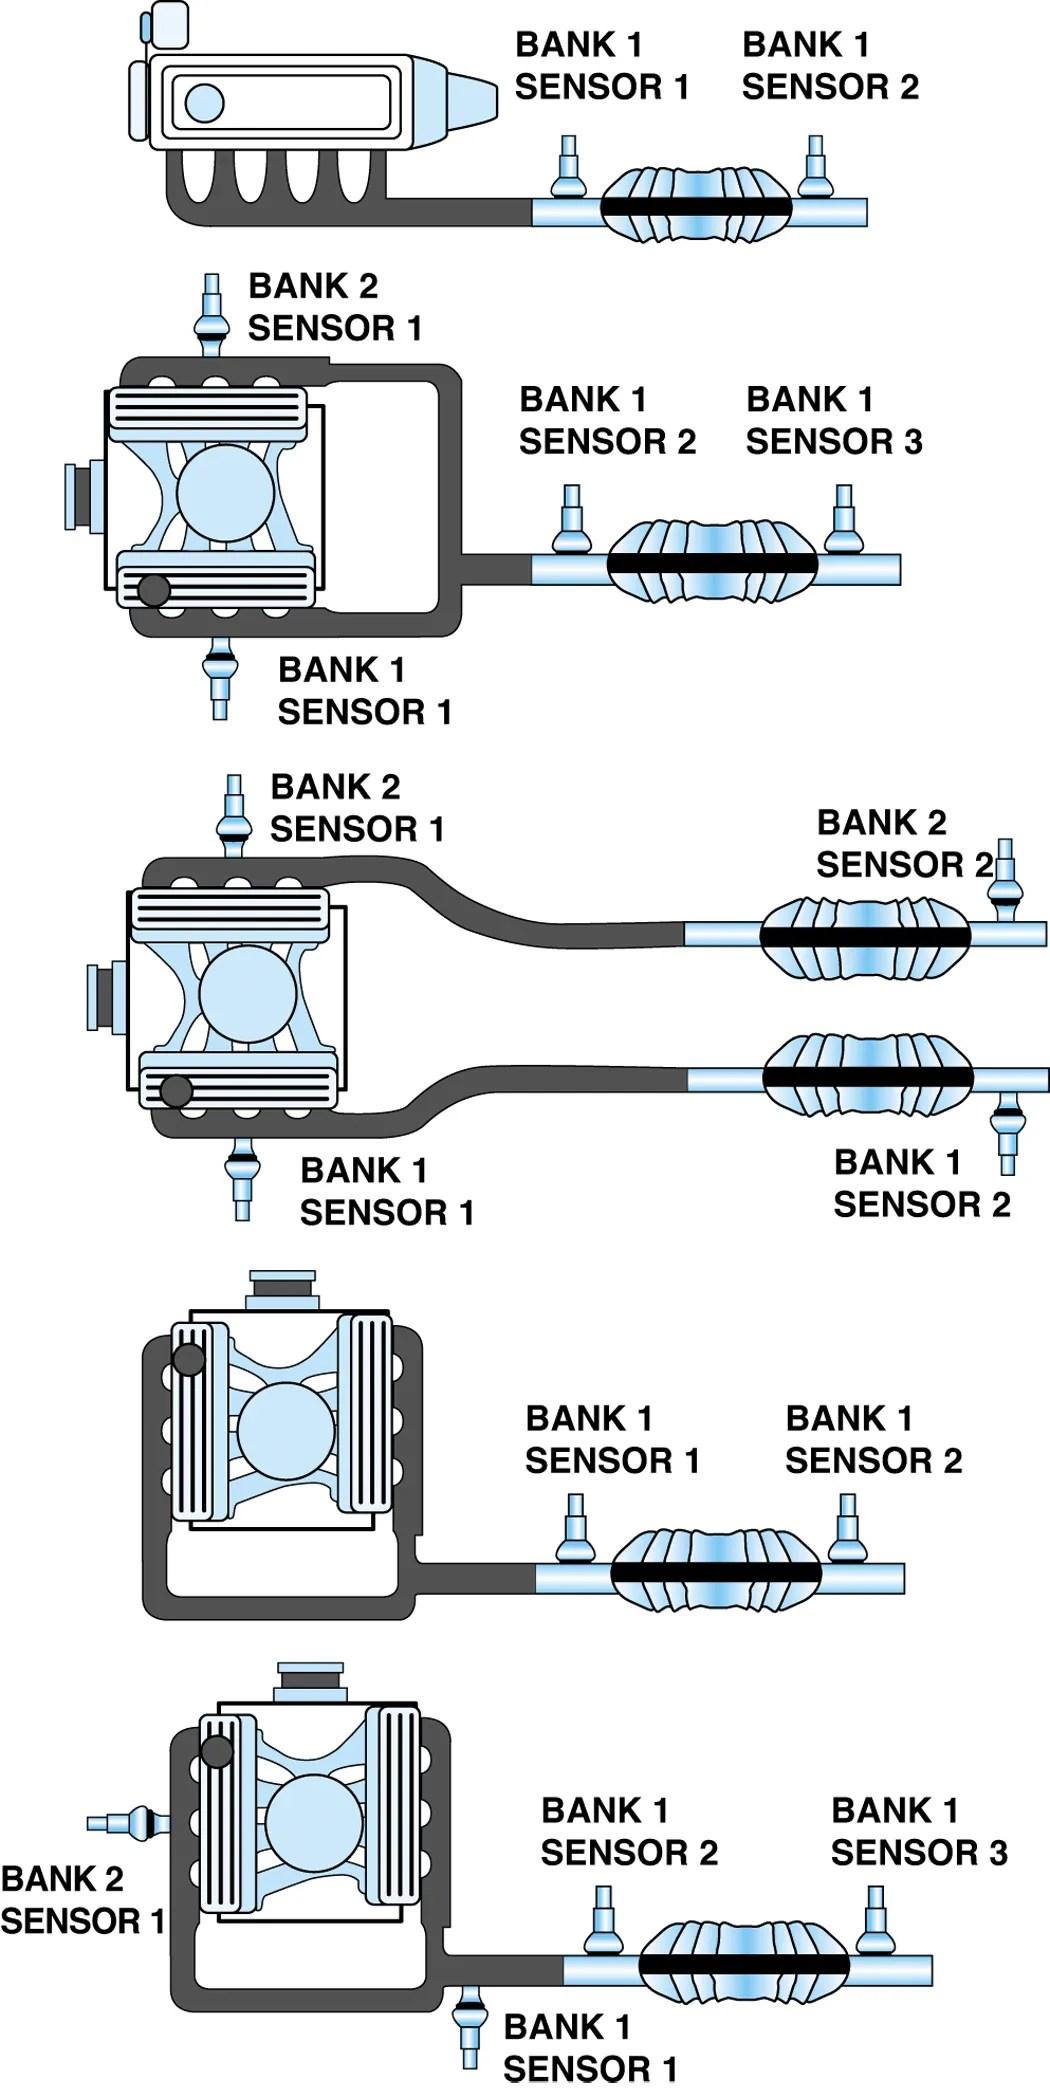 P0430 Catalytic Converter System Bank 2 Efficiency - Modern